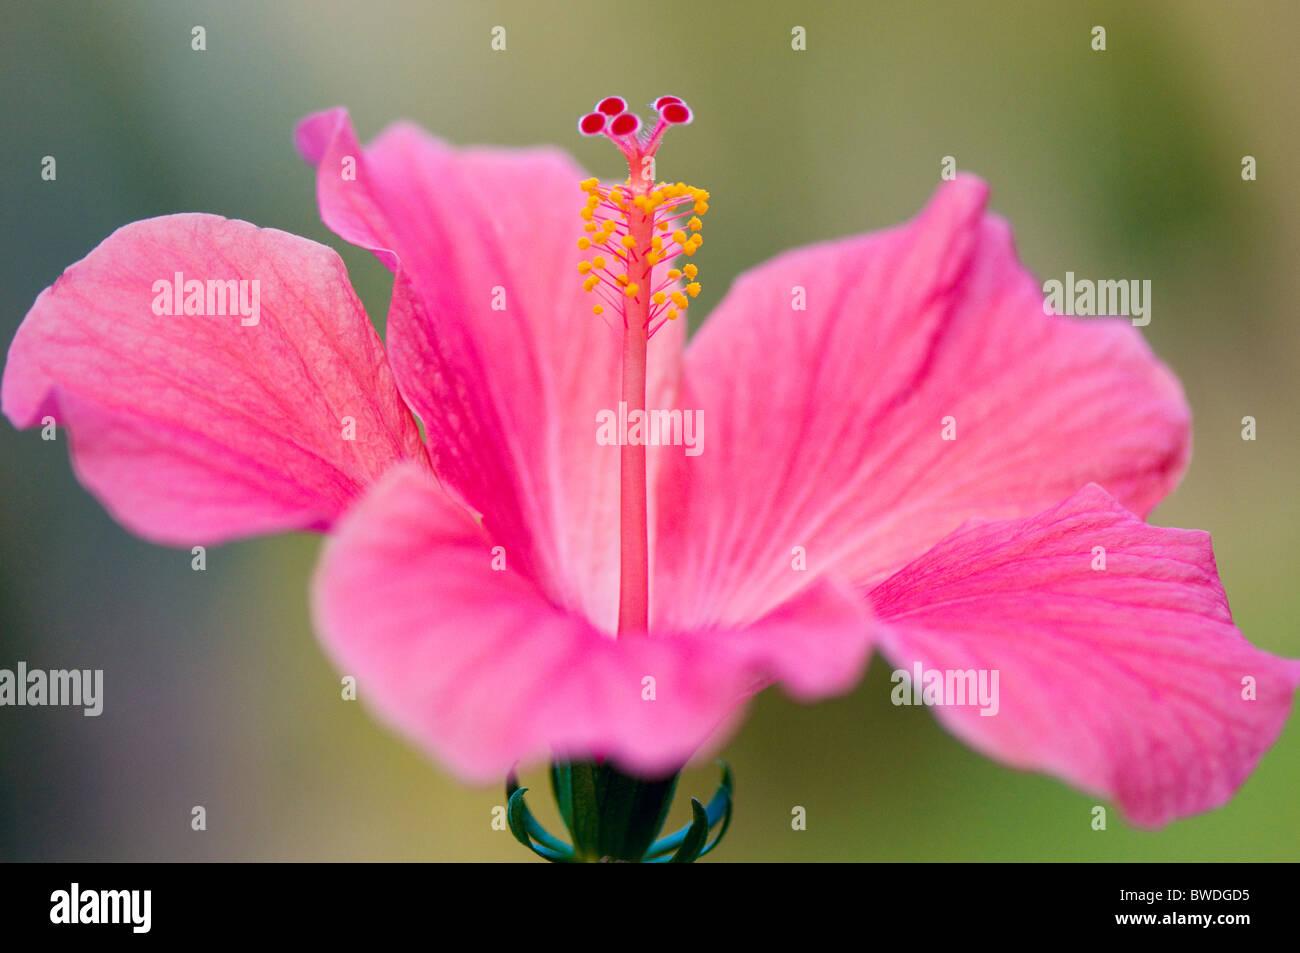 Pink hibiscus flower stock photos pink hibiscus flower stock a close up image of single pink hibiscus flower rosa sinensis stock izmirmasajfo